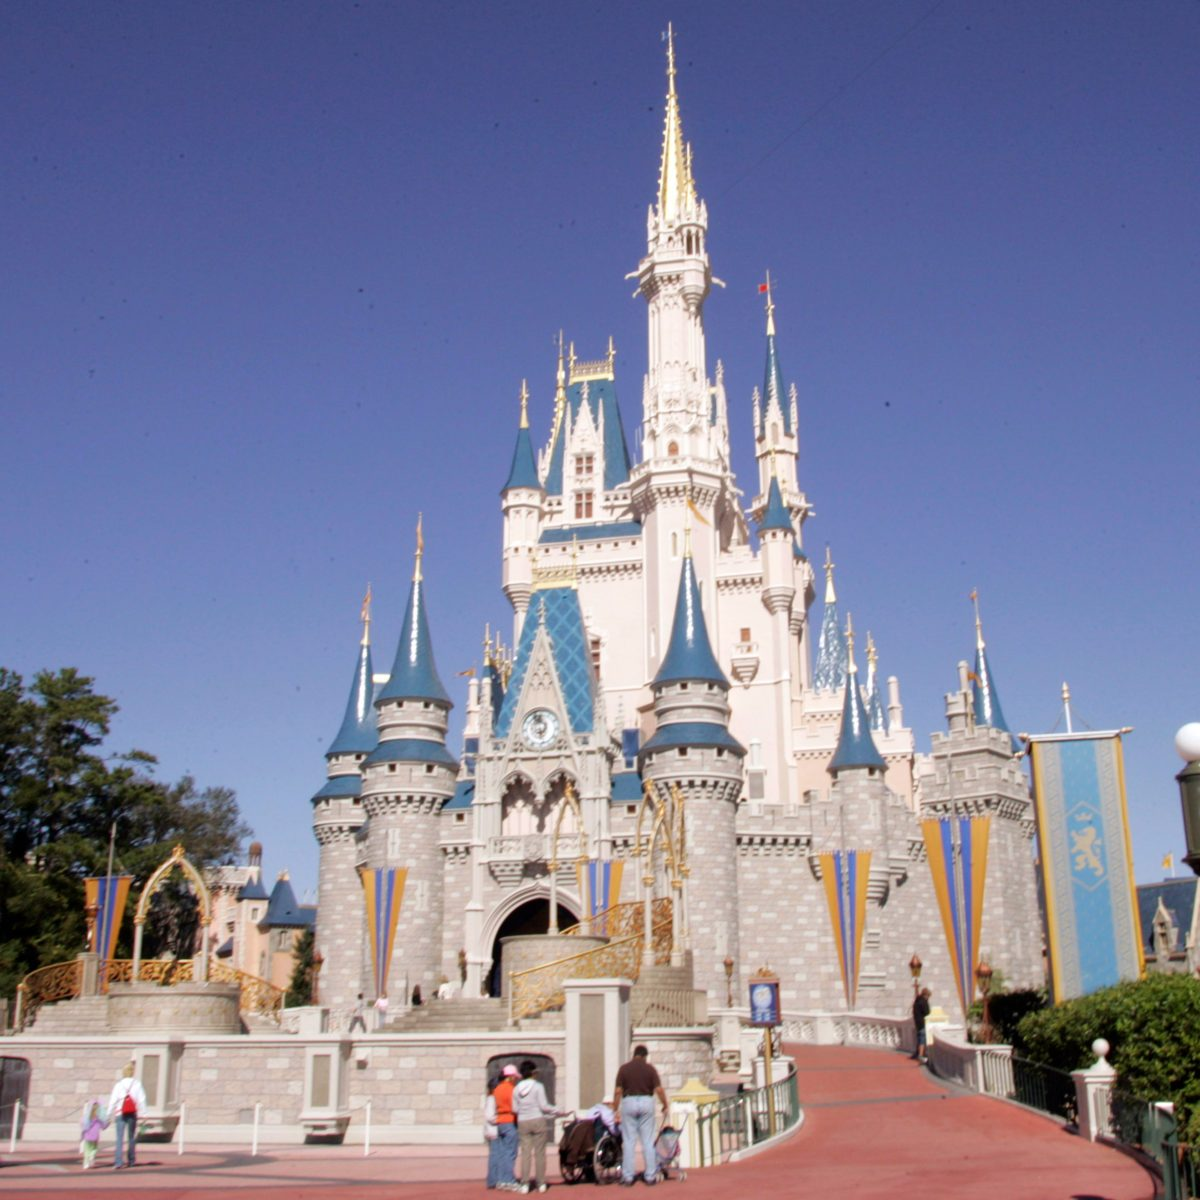 Insider Secrets from a Disney World Super-Fan | Reader's Digest